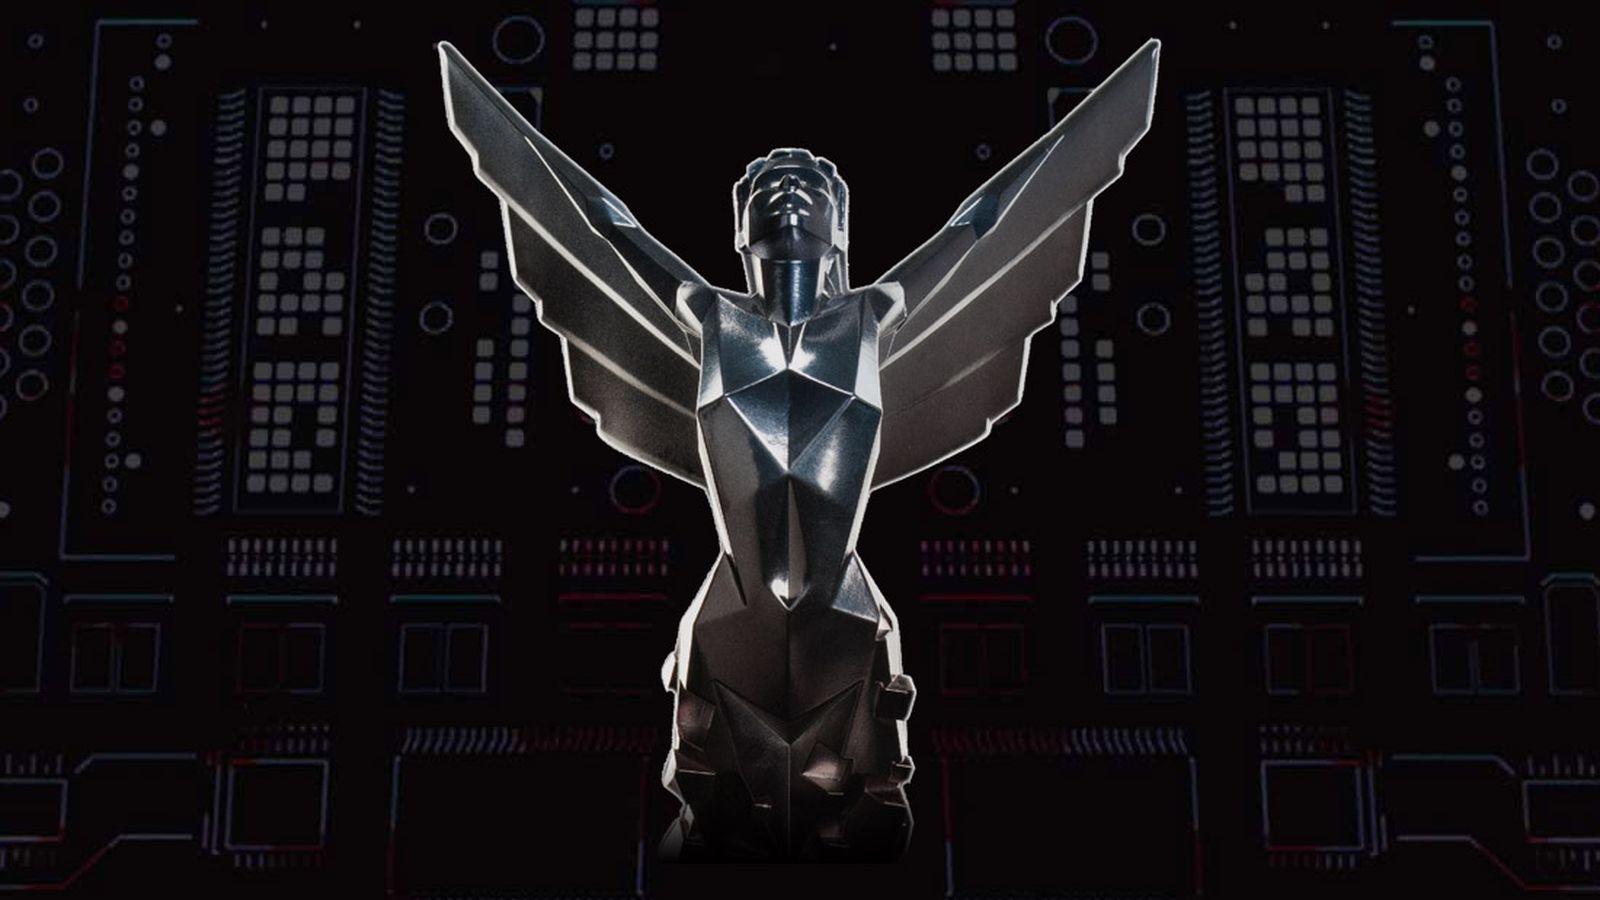 ¡Estos son los nominados a los Game Of The Year Awards! - - Assassin's Creed Odyssey- Celeste- God of War- Marvel's Spider-Man- Monster Hunter World- Red Dead Redemption II¡Vota por tu favorito pinchando aquí!